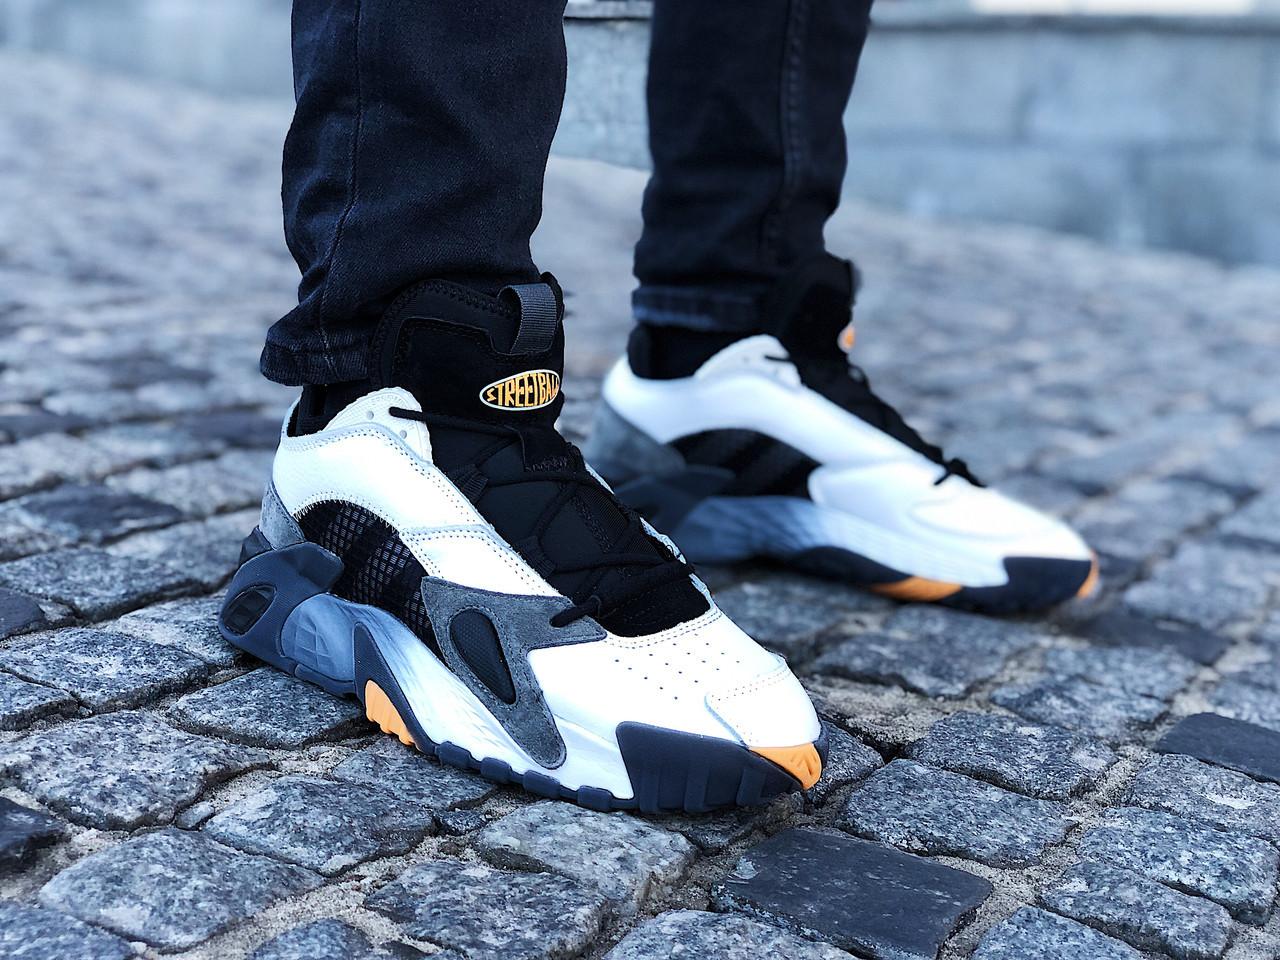 Кроссовки мужские Adidas StreetBall (Размеры:42,43,44,45)